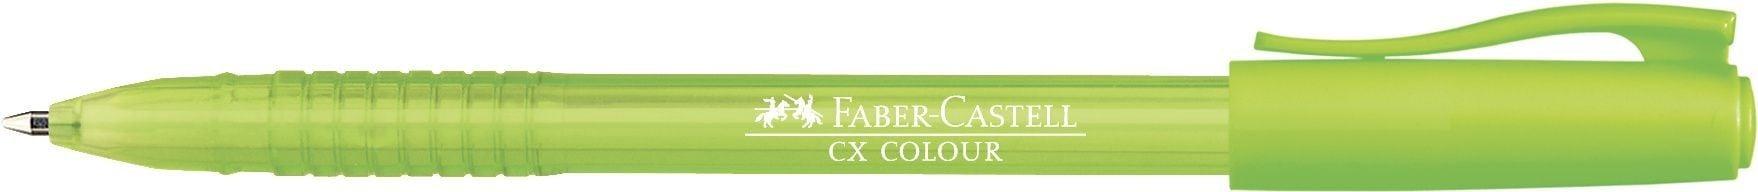 ROLLER 1MM SEMI-GEL CX COLOUR VERDE LIME FABER-CASTELL